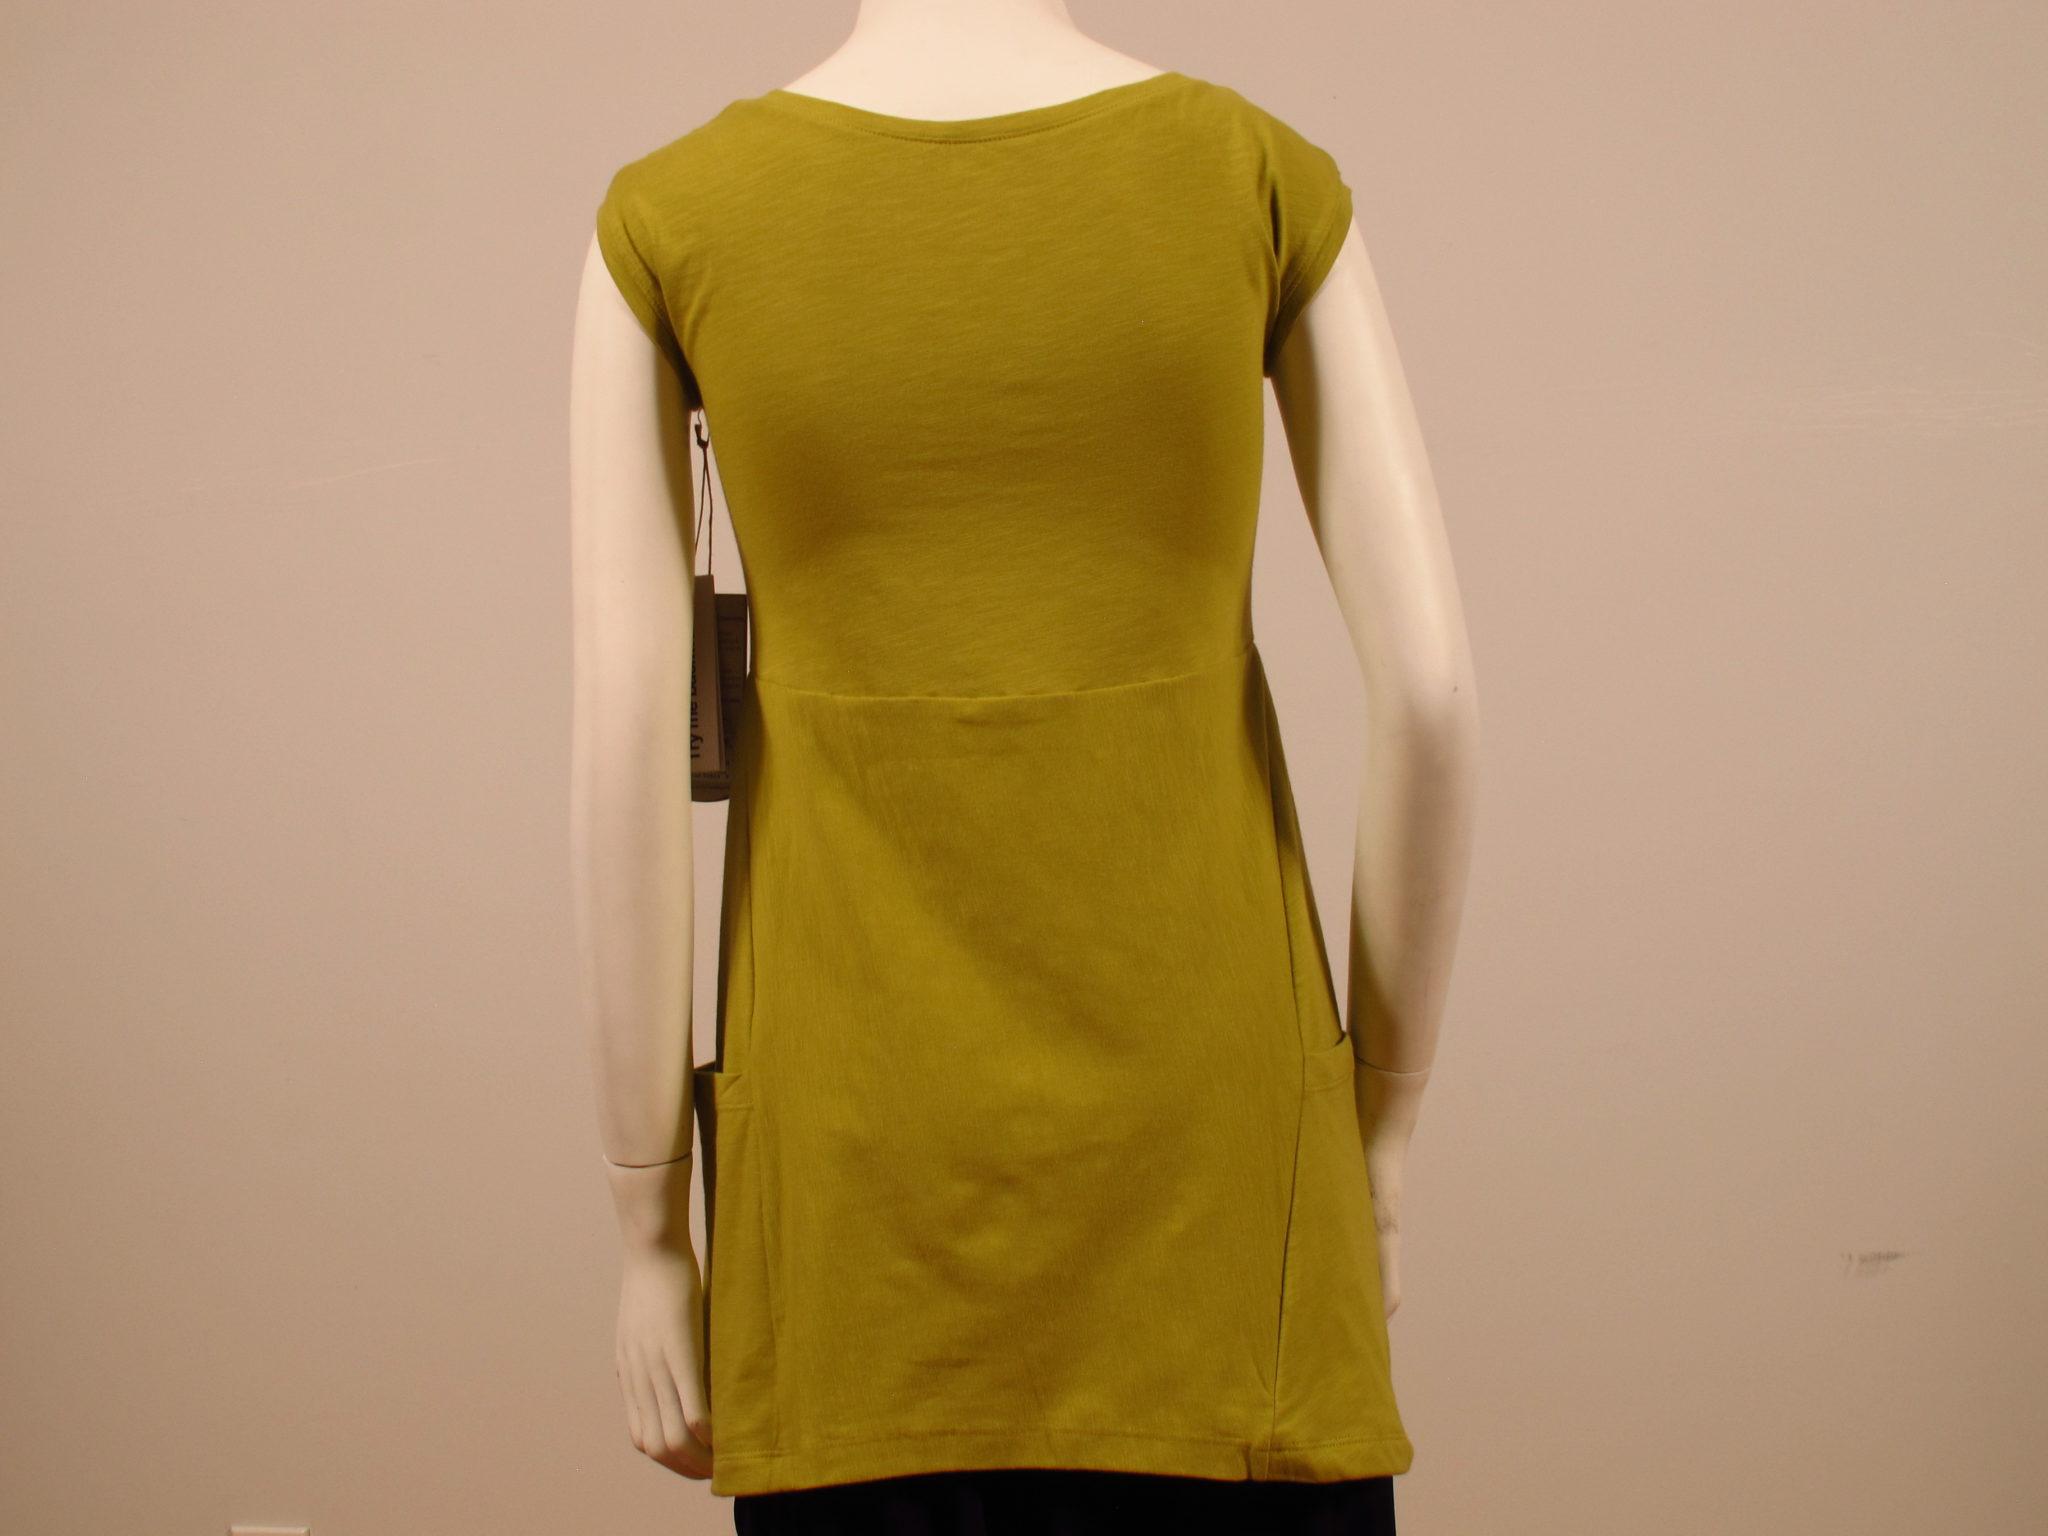 595a395fd38923 Maggie's Organics. Organic Cotton Sleeveless Slub. - Lea's